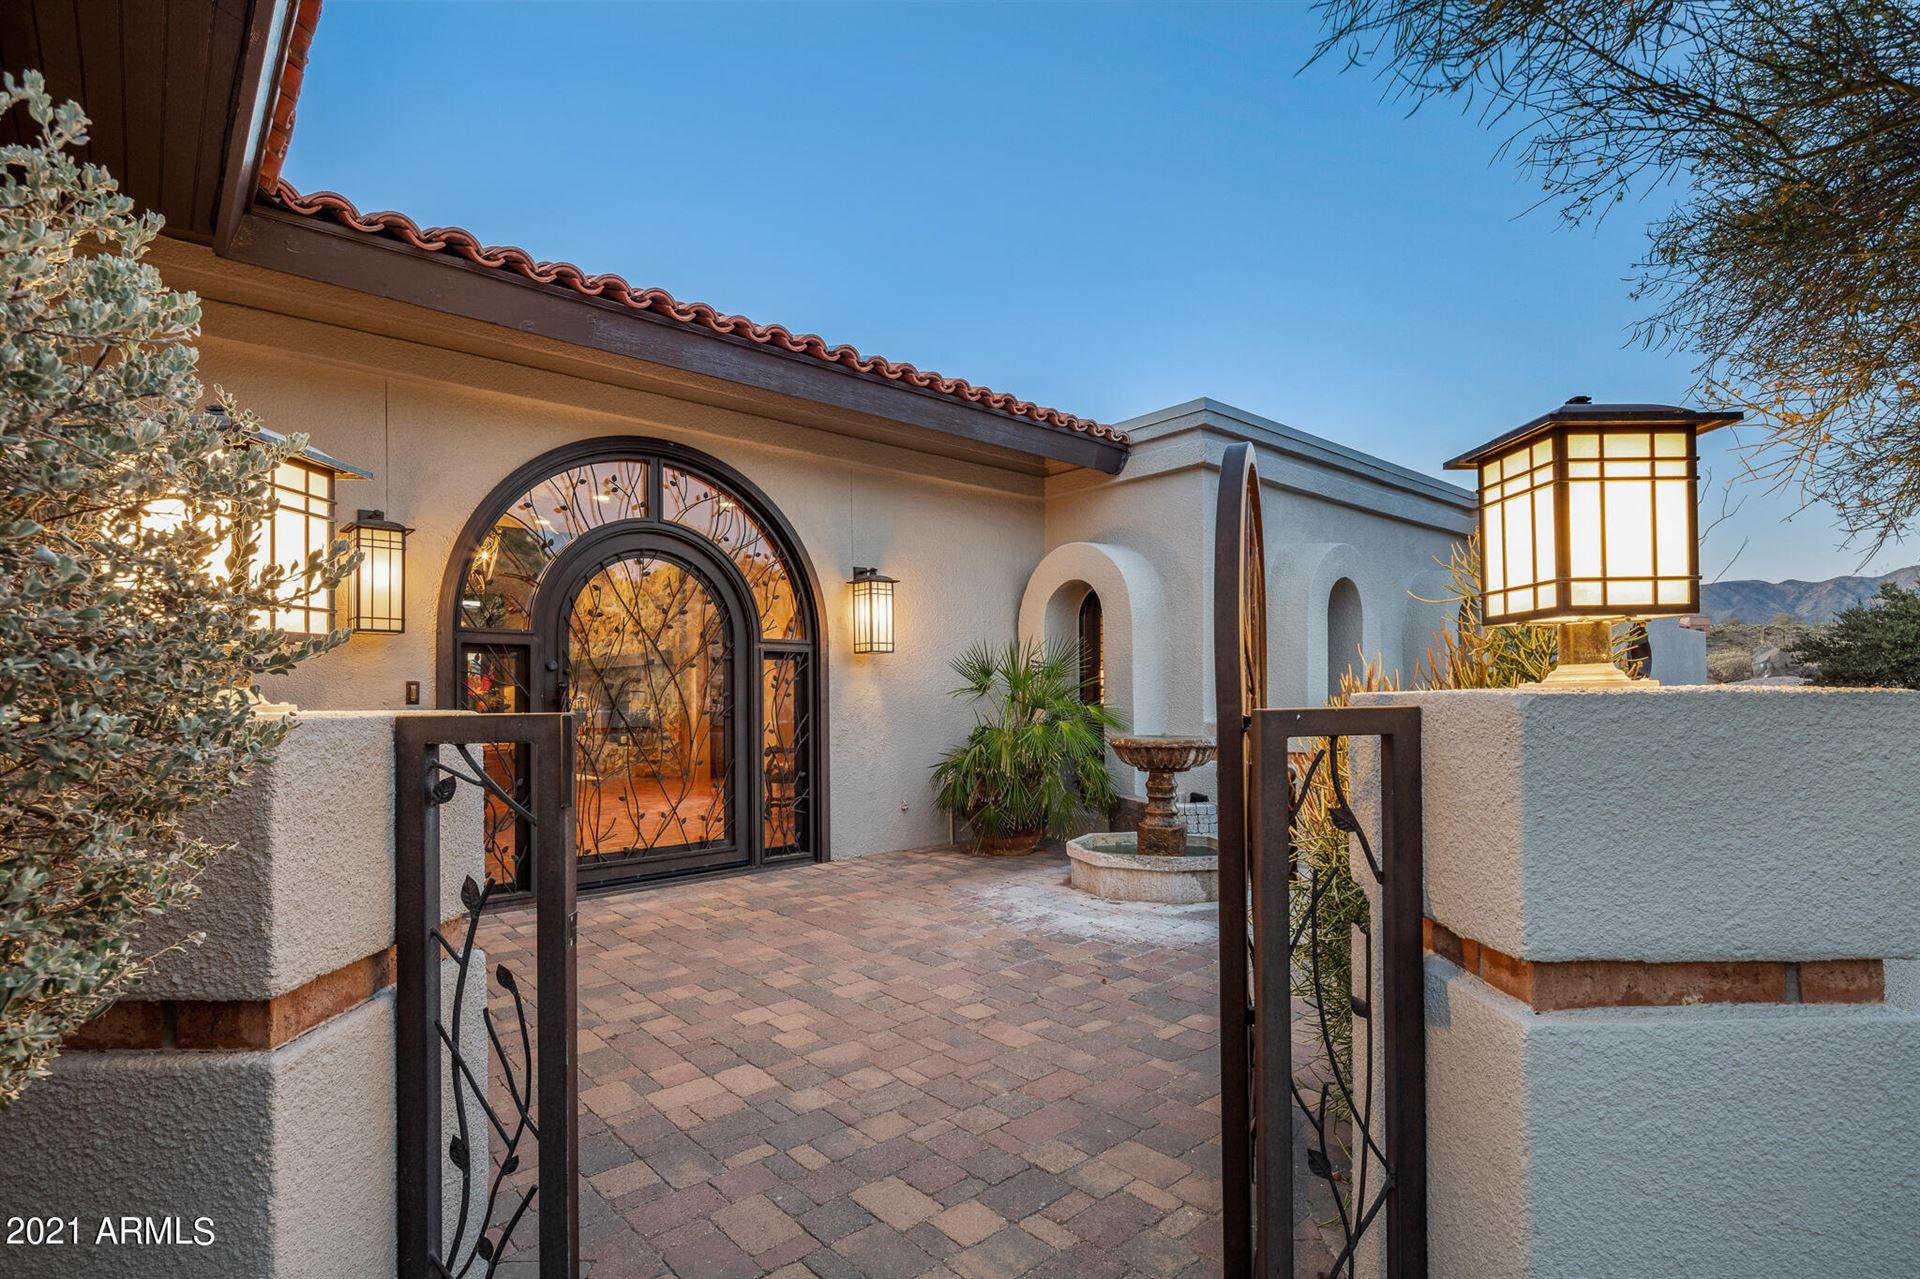 Photo of 8616 E CONCHO Lane, Carefree, AZ 85377 (MLS # 6233782)